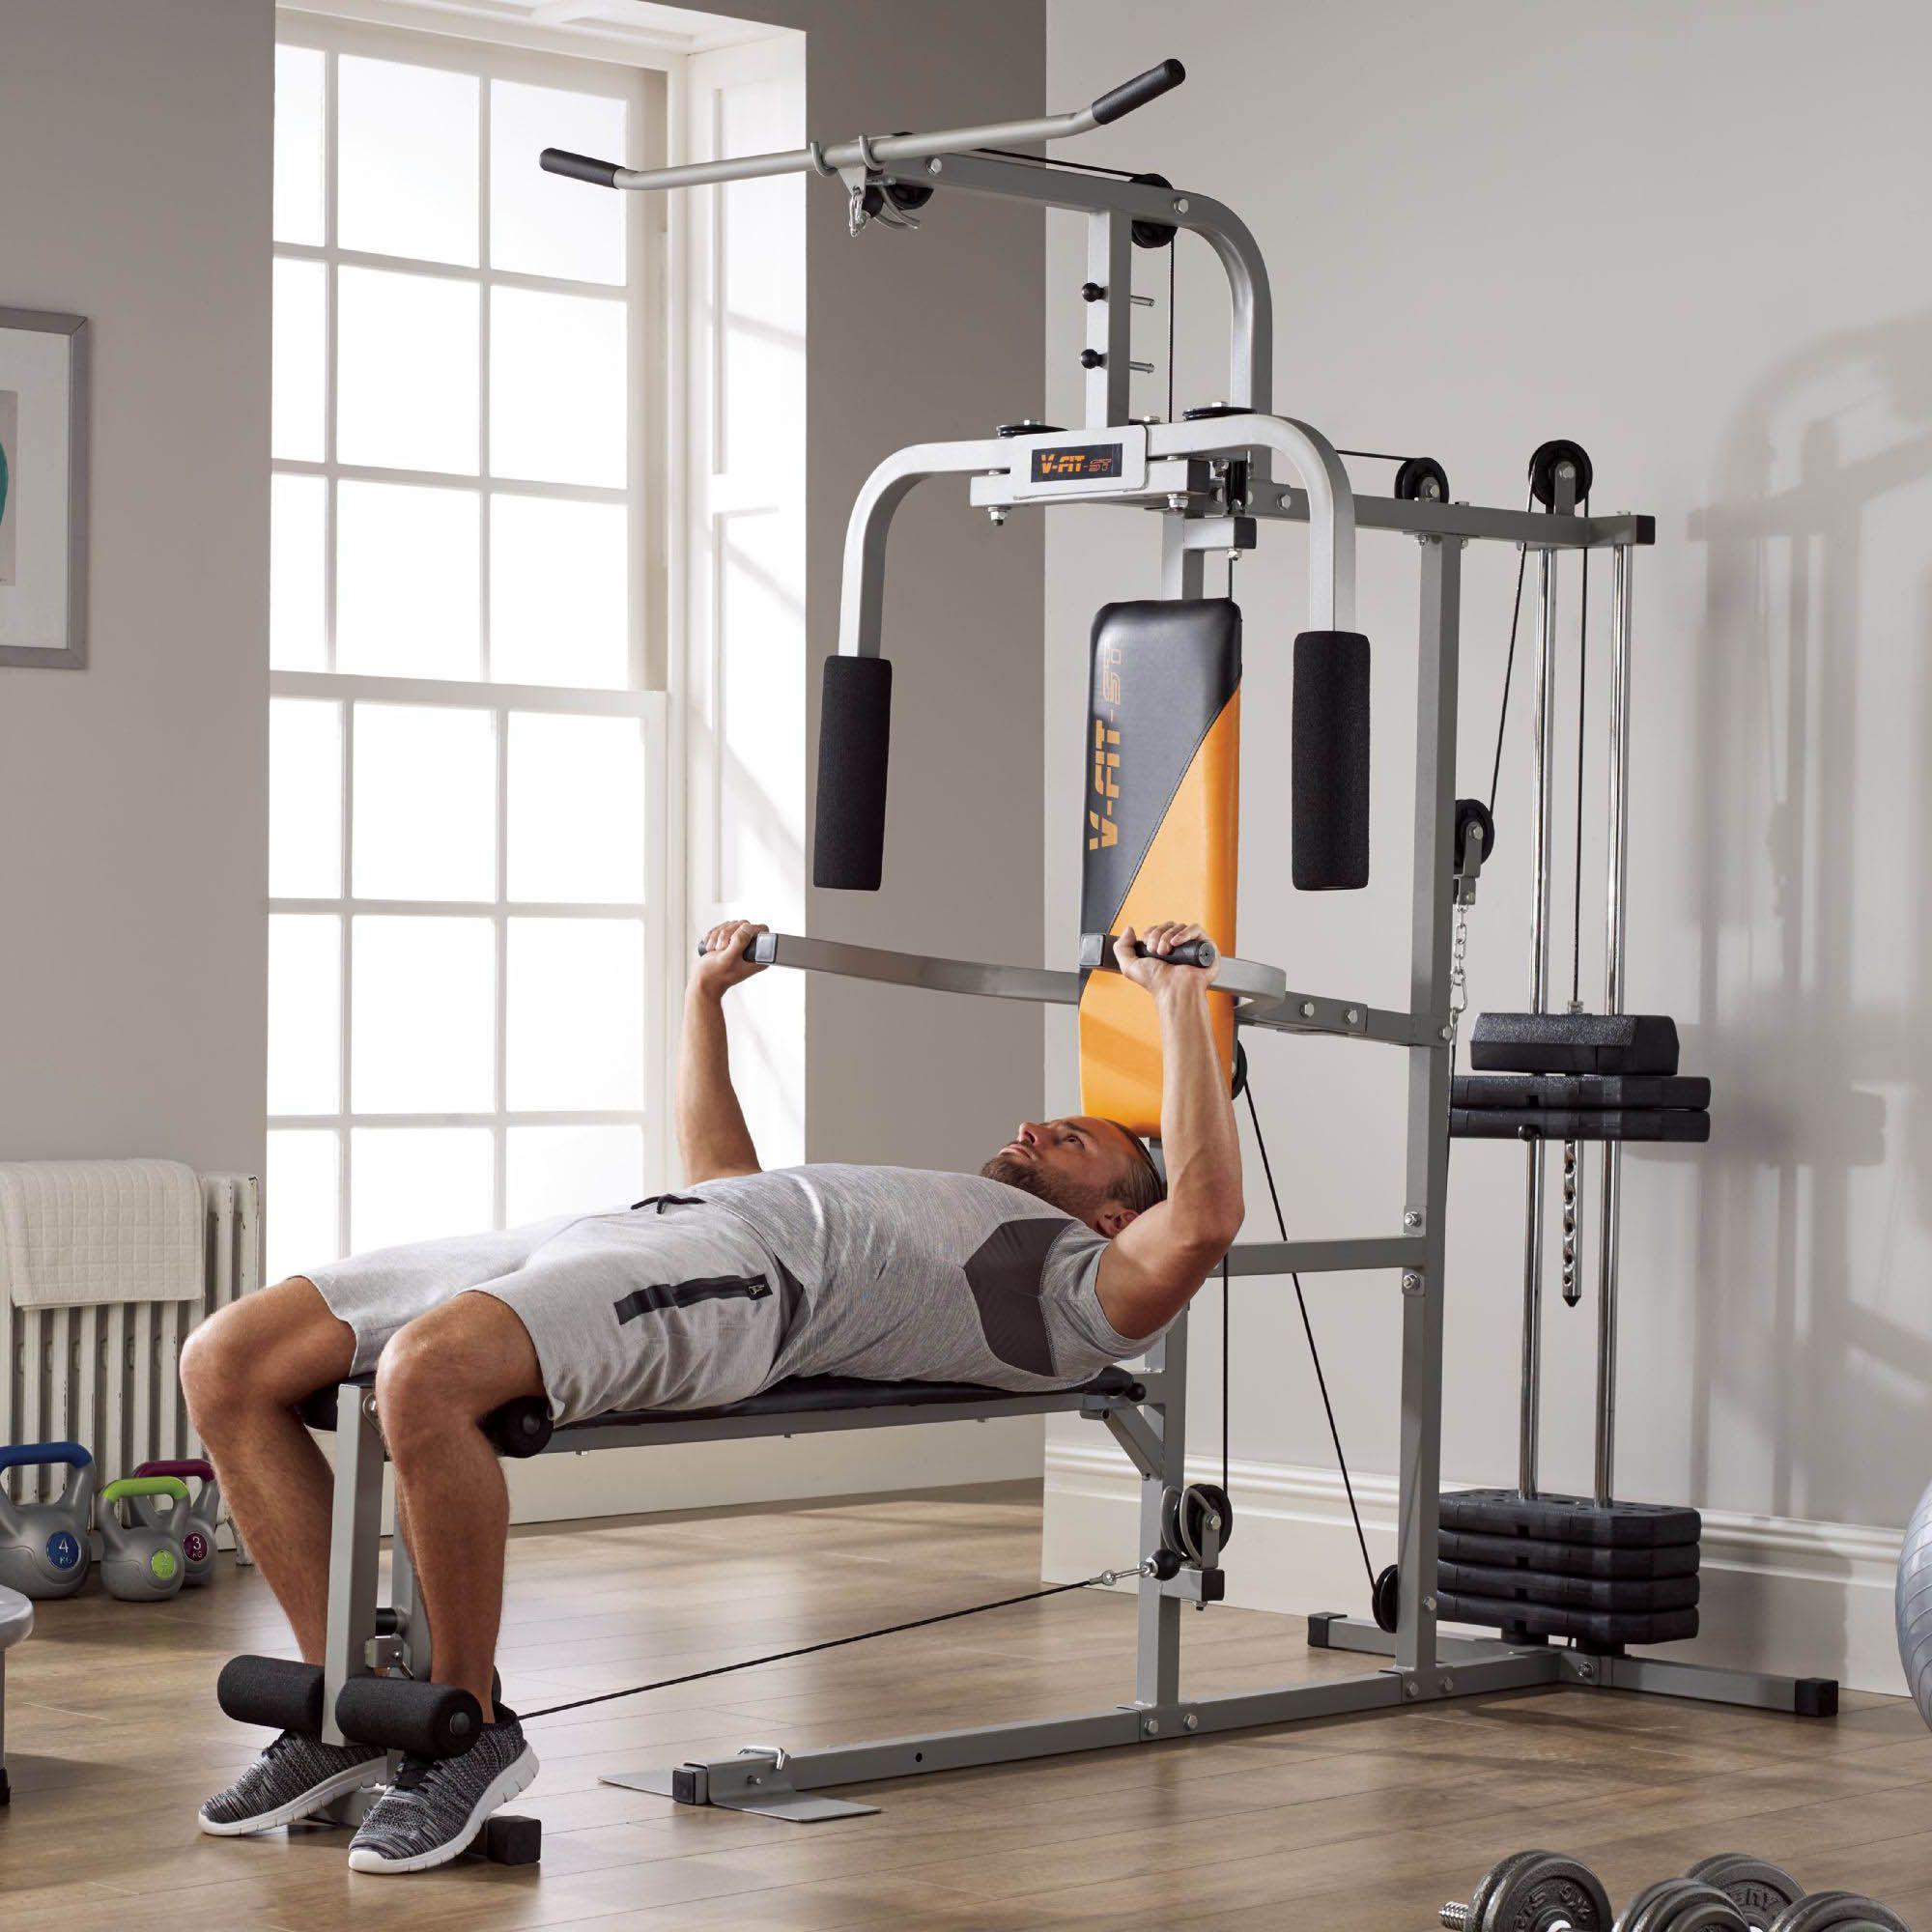 V fit herculean cobra lay flat multi gym sweatband